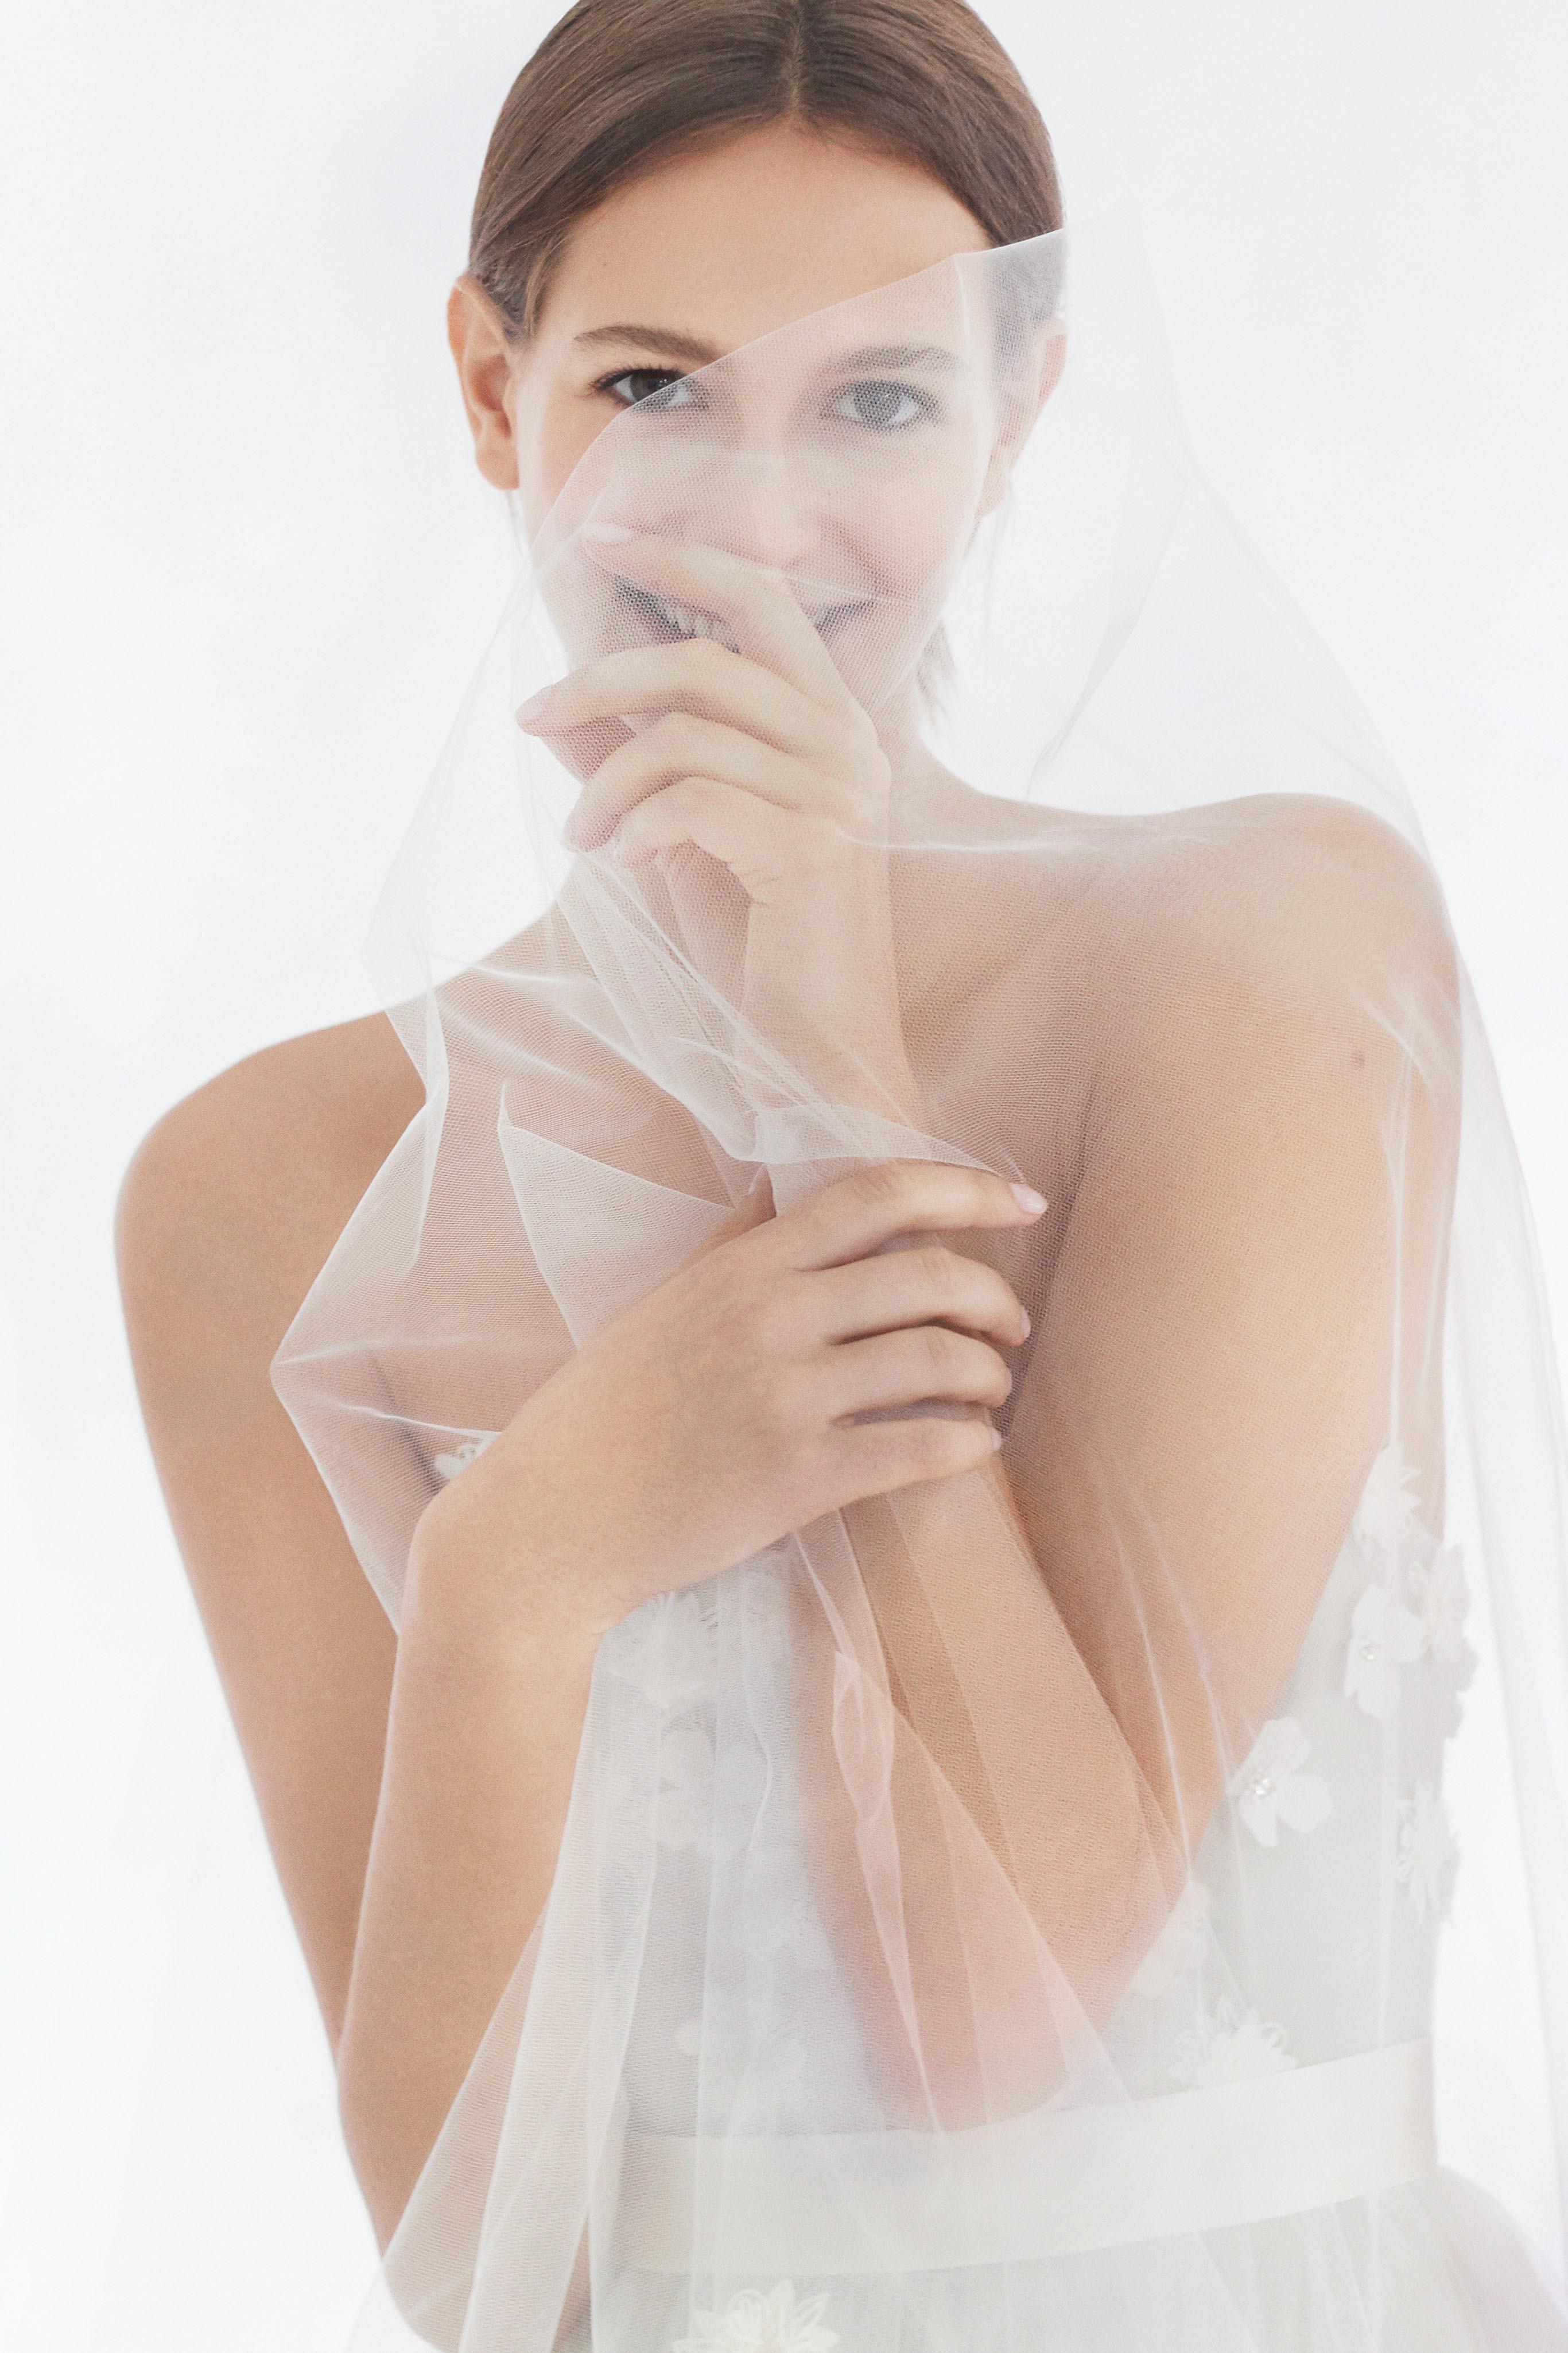 carolina herrera wedding dress fall 2018 tulle close up flower details